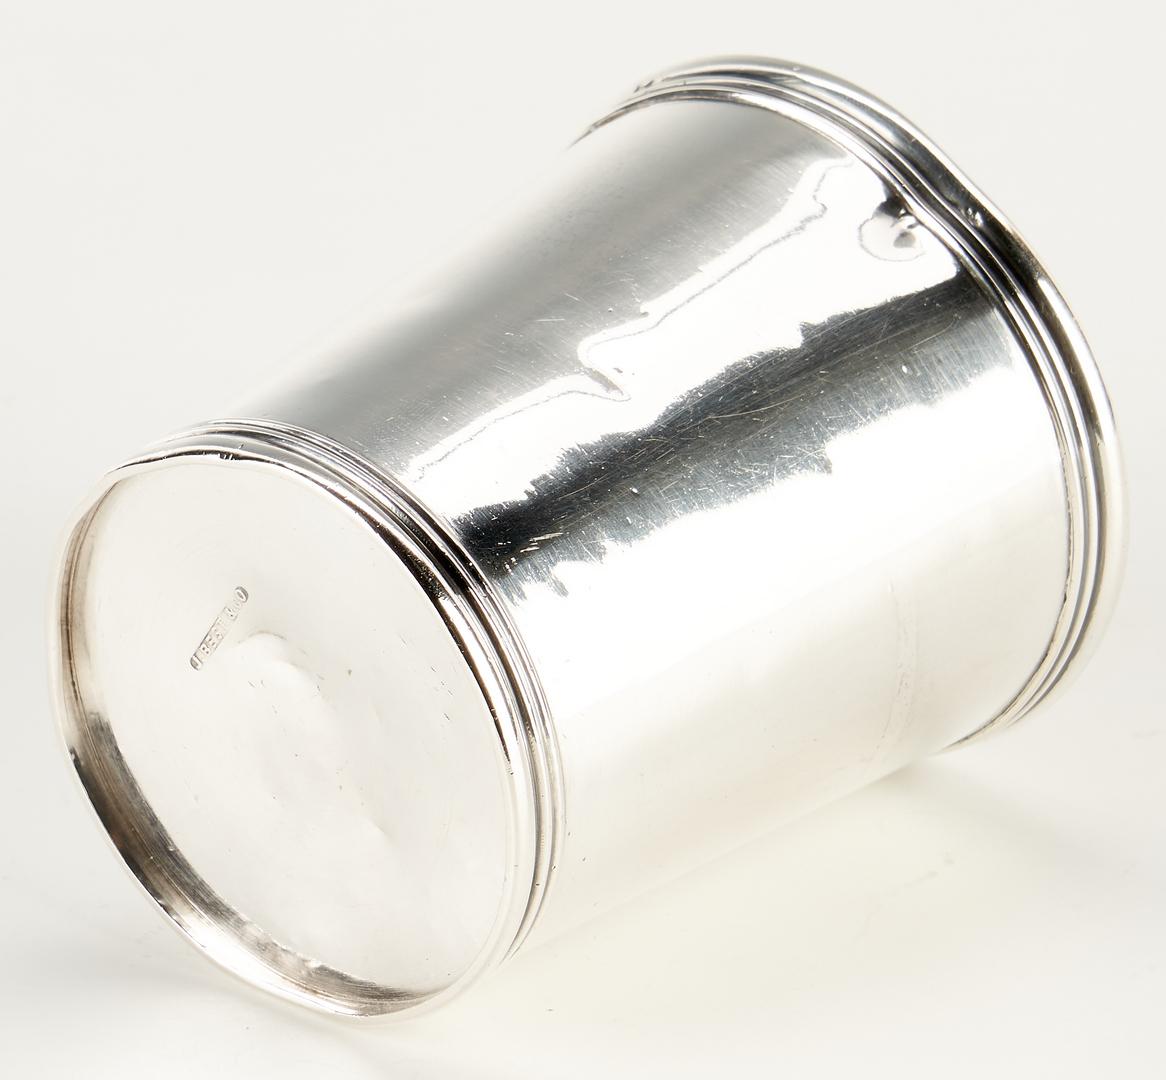 Lot 294: KY Coin Silver Julep Cup, Best & Co., Lexington